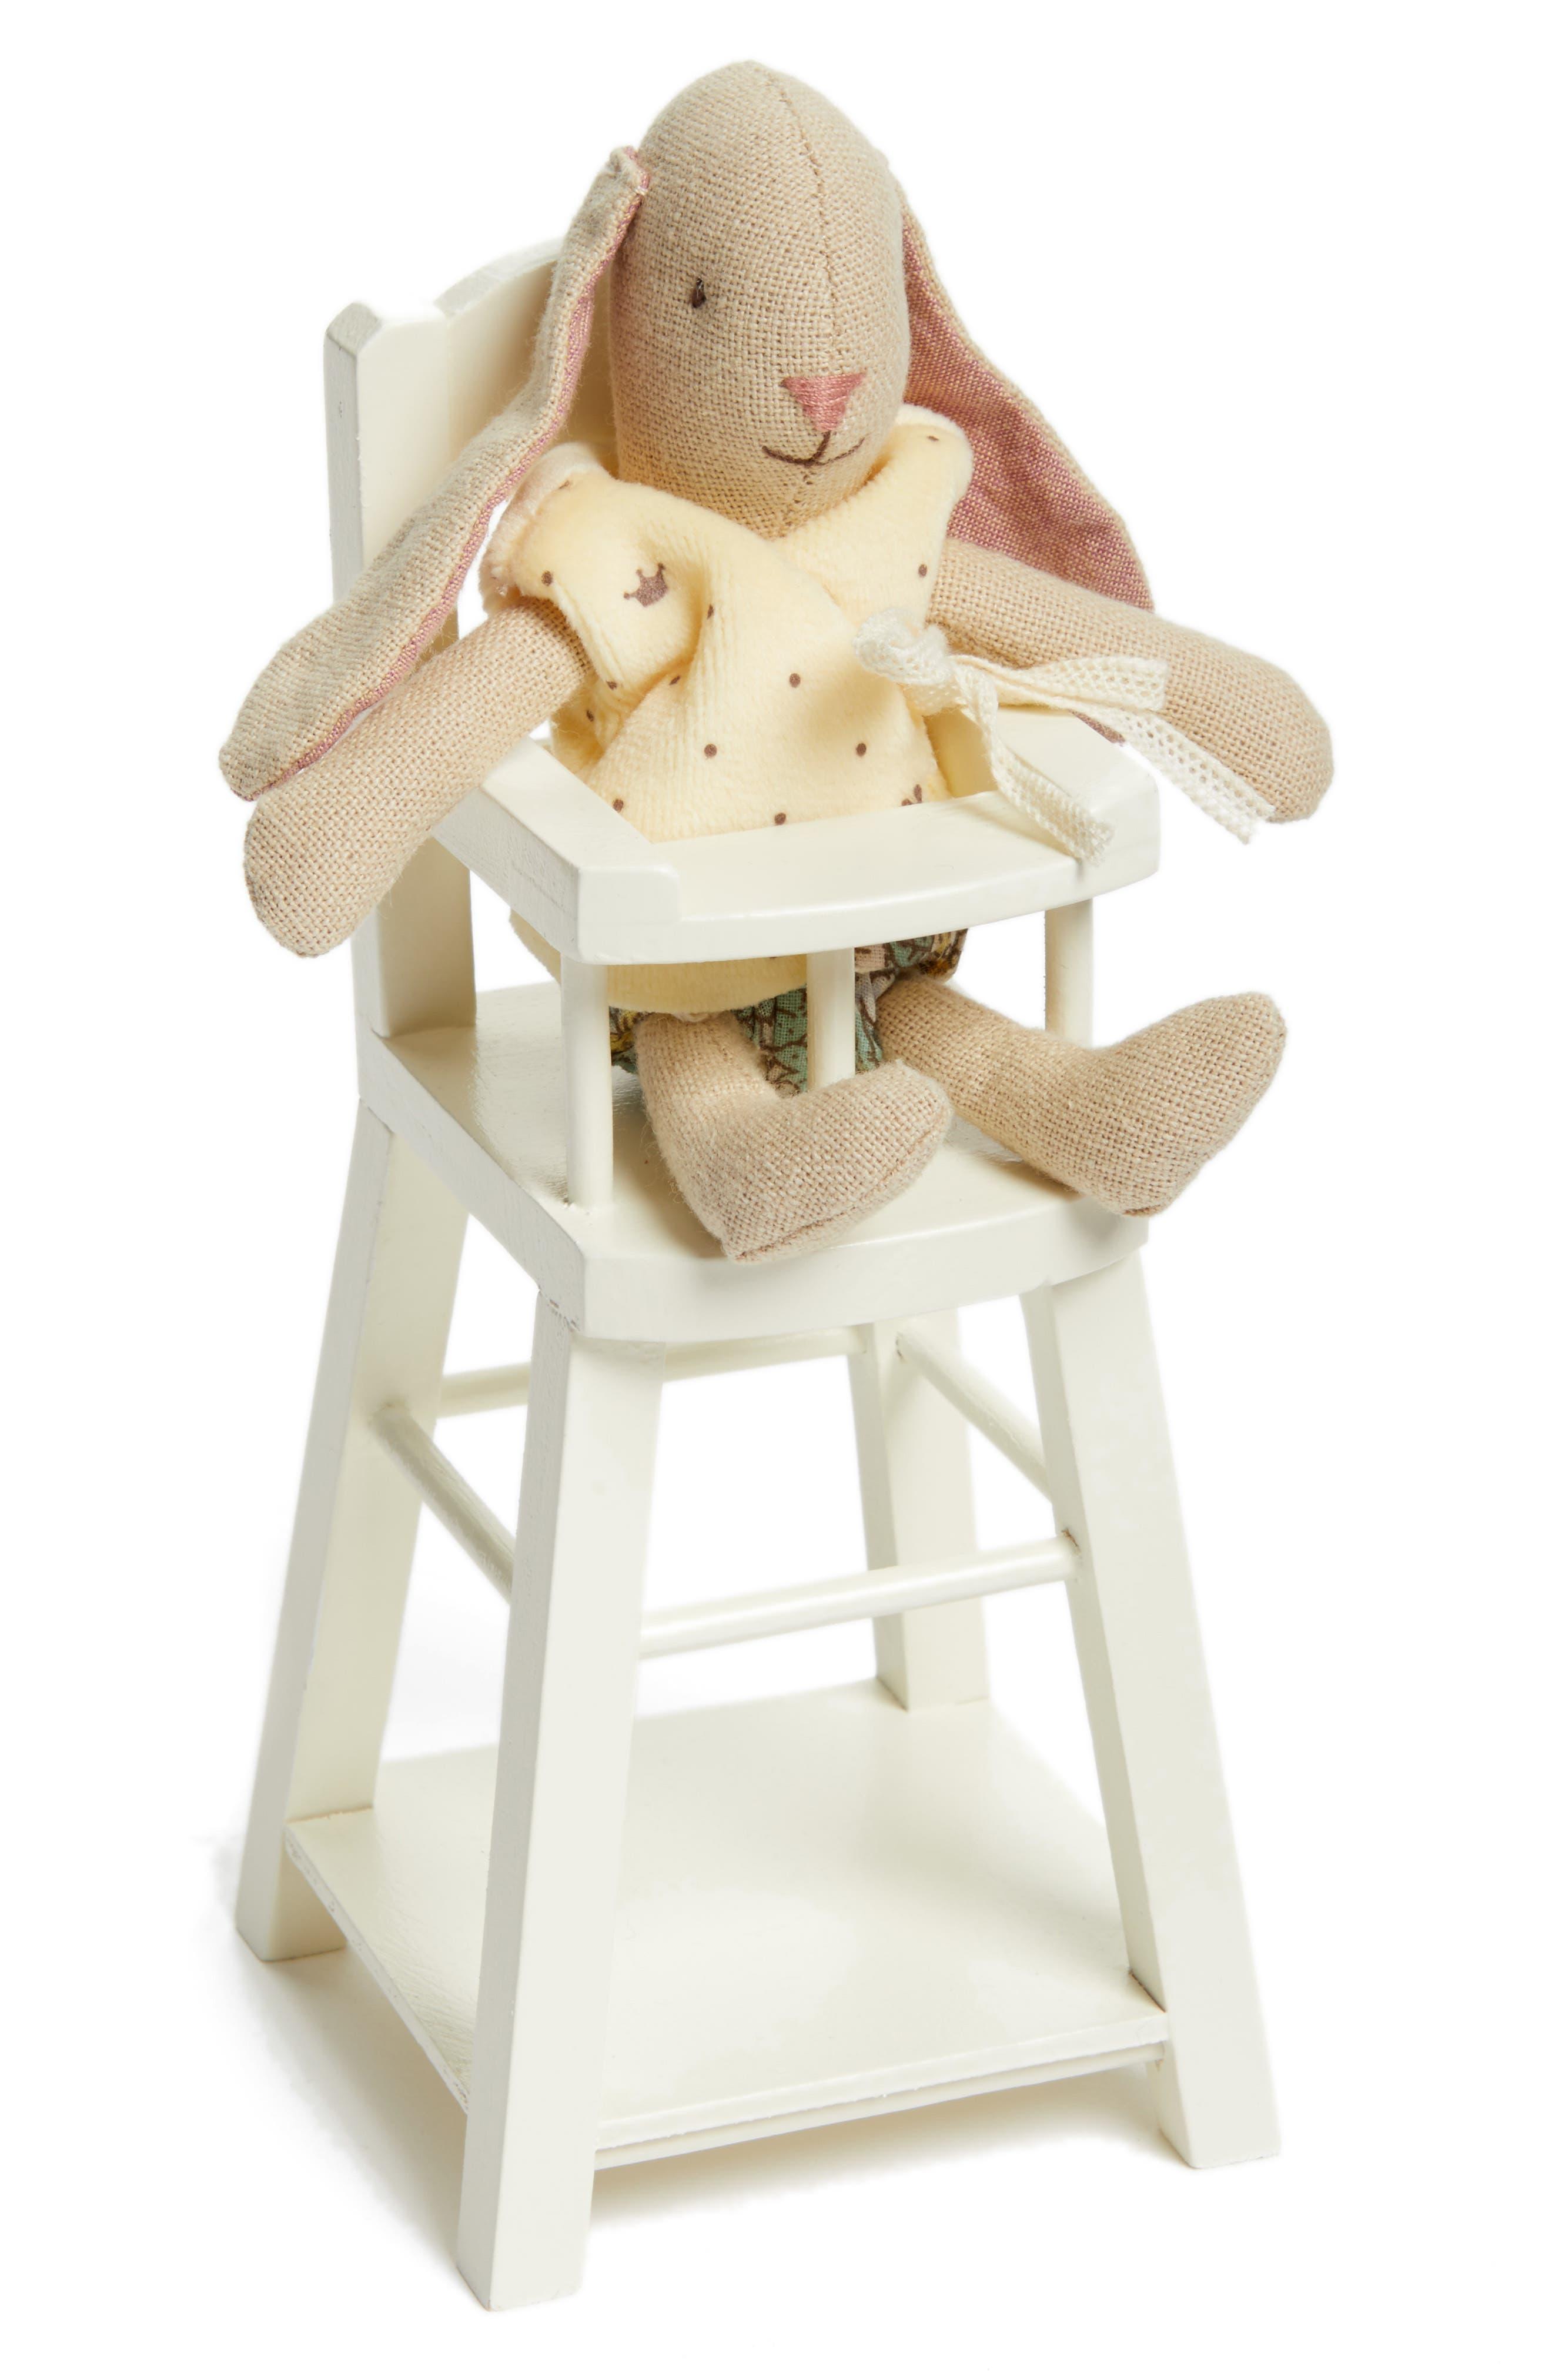 Micro Bunny Rabbit Stuffed Animal and Highchair,                             Main thumbnail 1, color,                             020